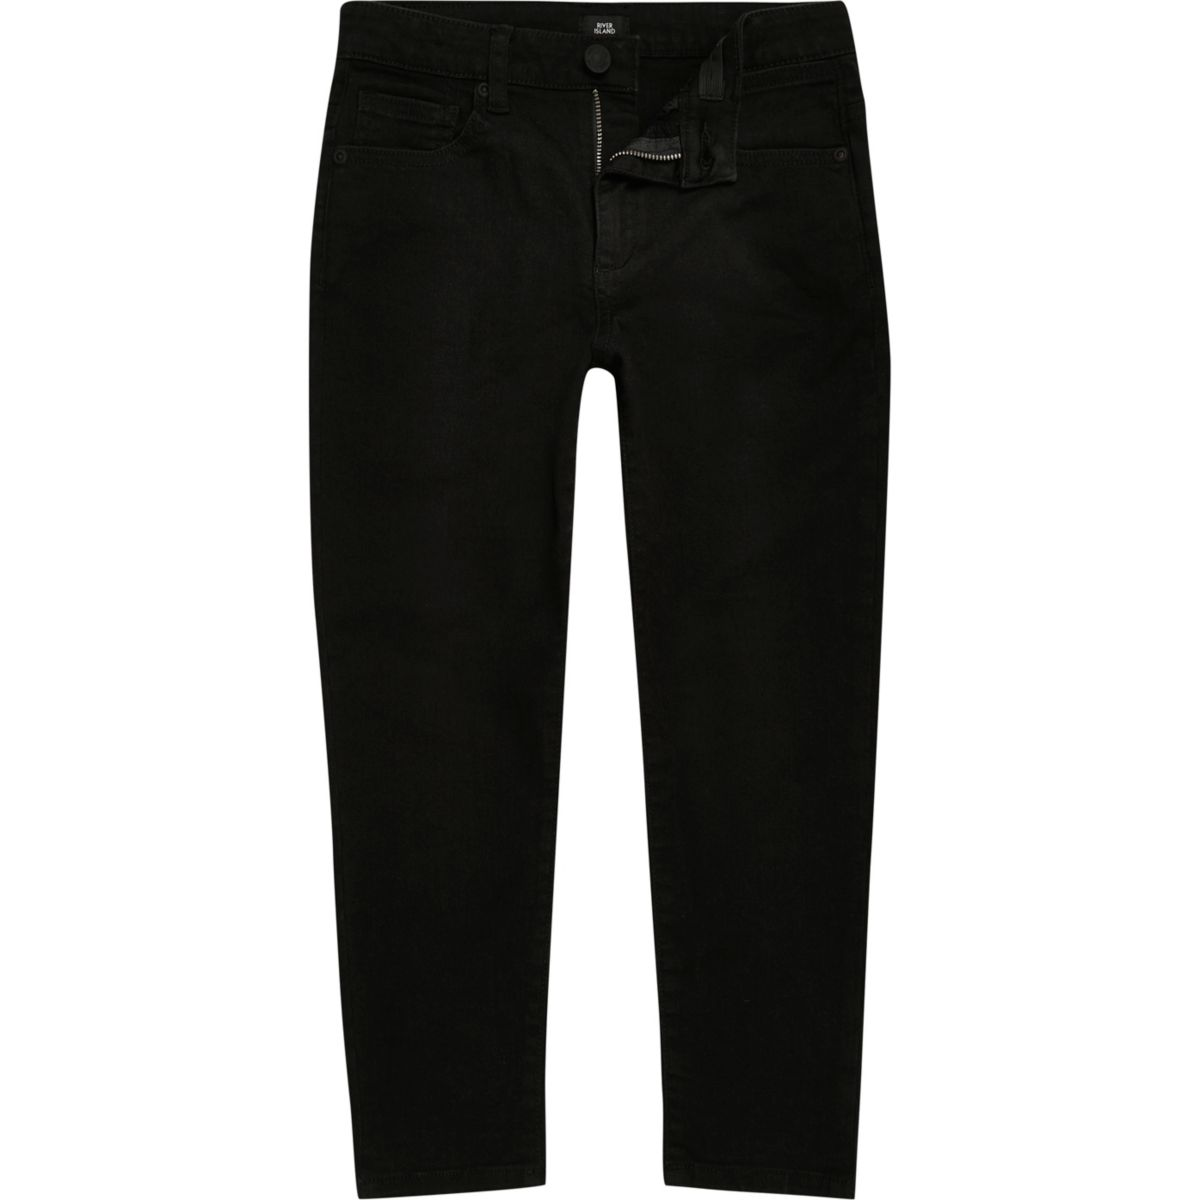 Boys black Jimmy slim fit tapered jeans